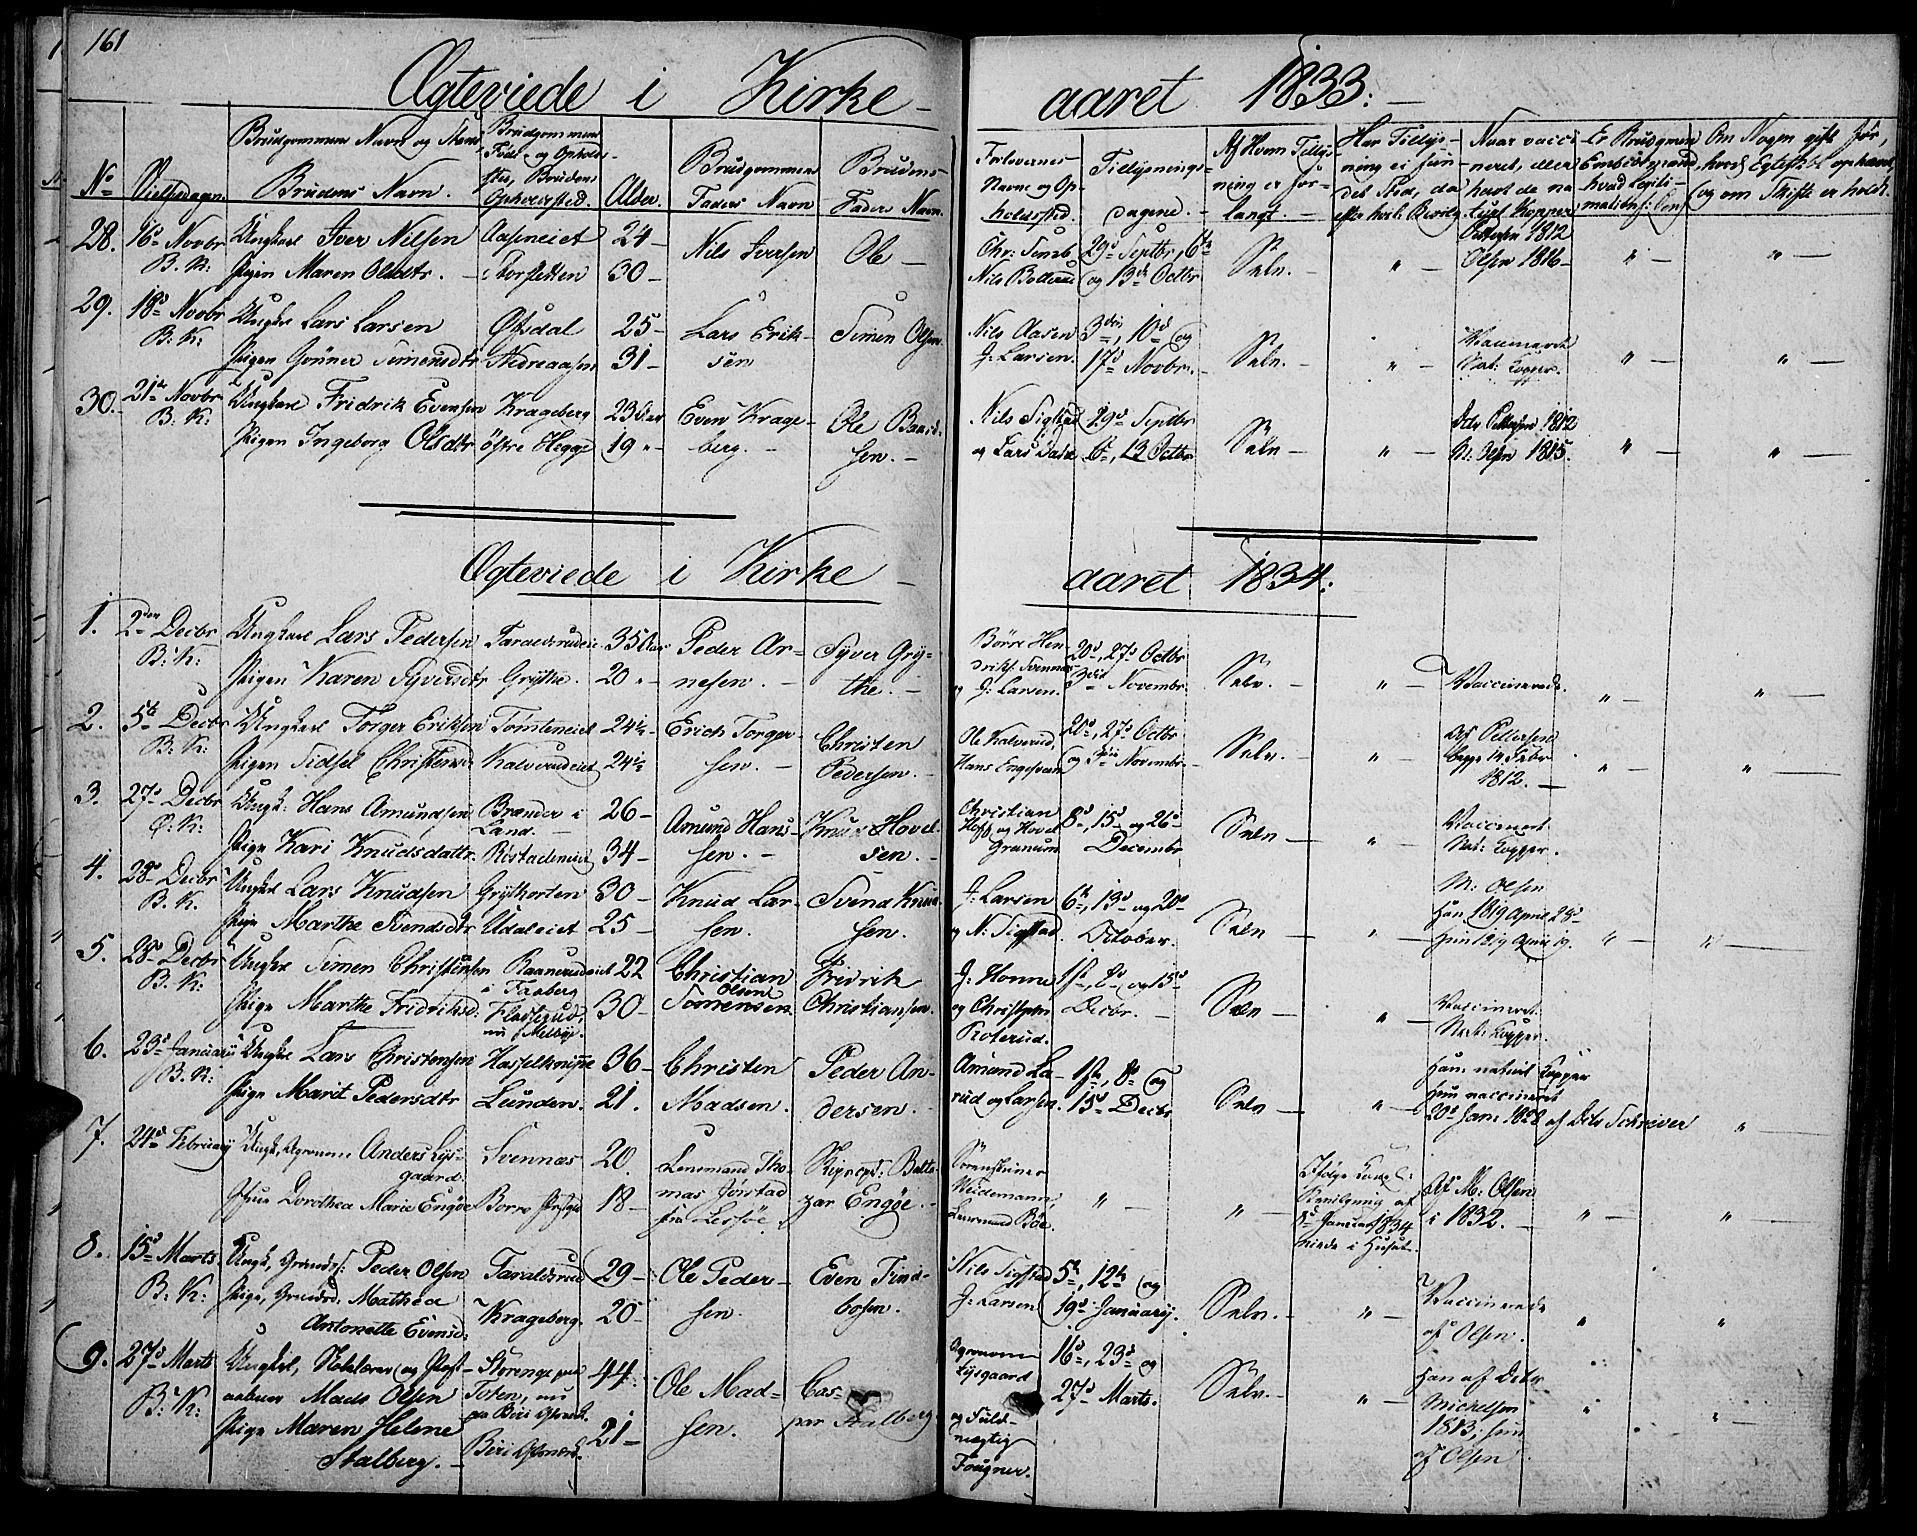 SAH, Biri prestekontor, Ministerialbok nr. 4, 1829-1842, s. 161